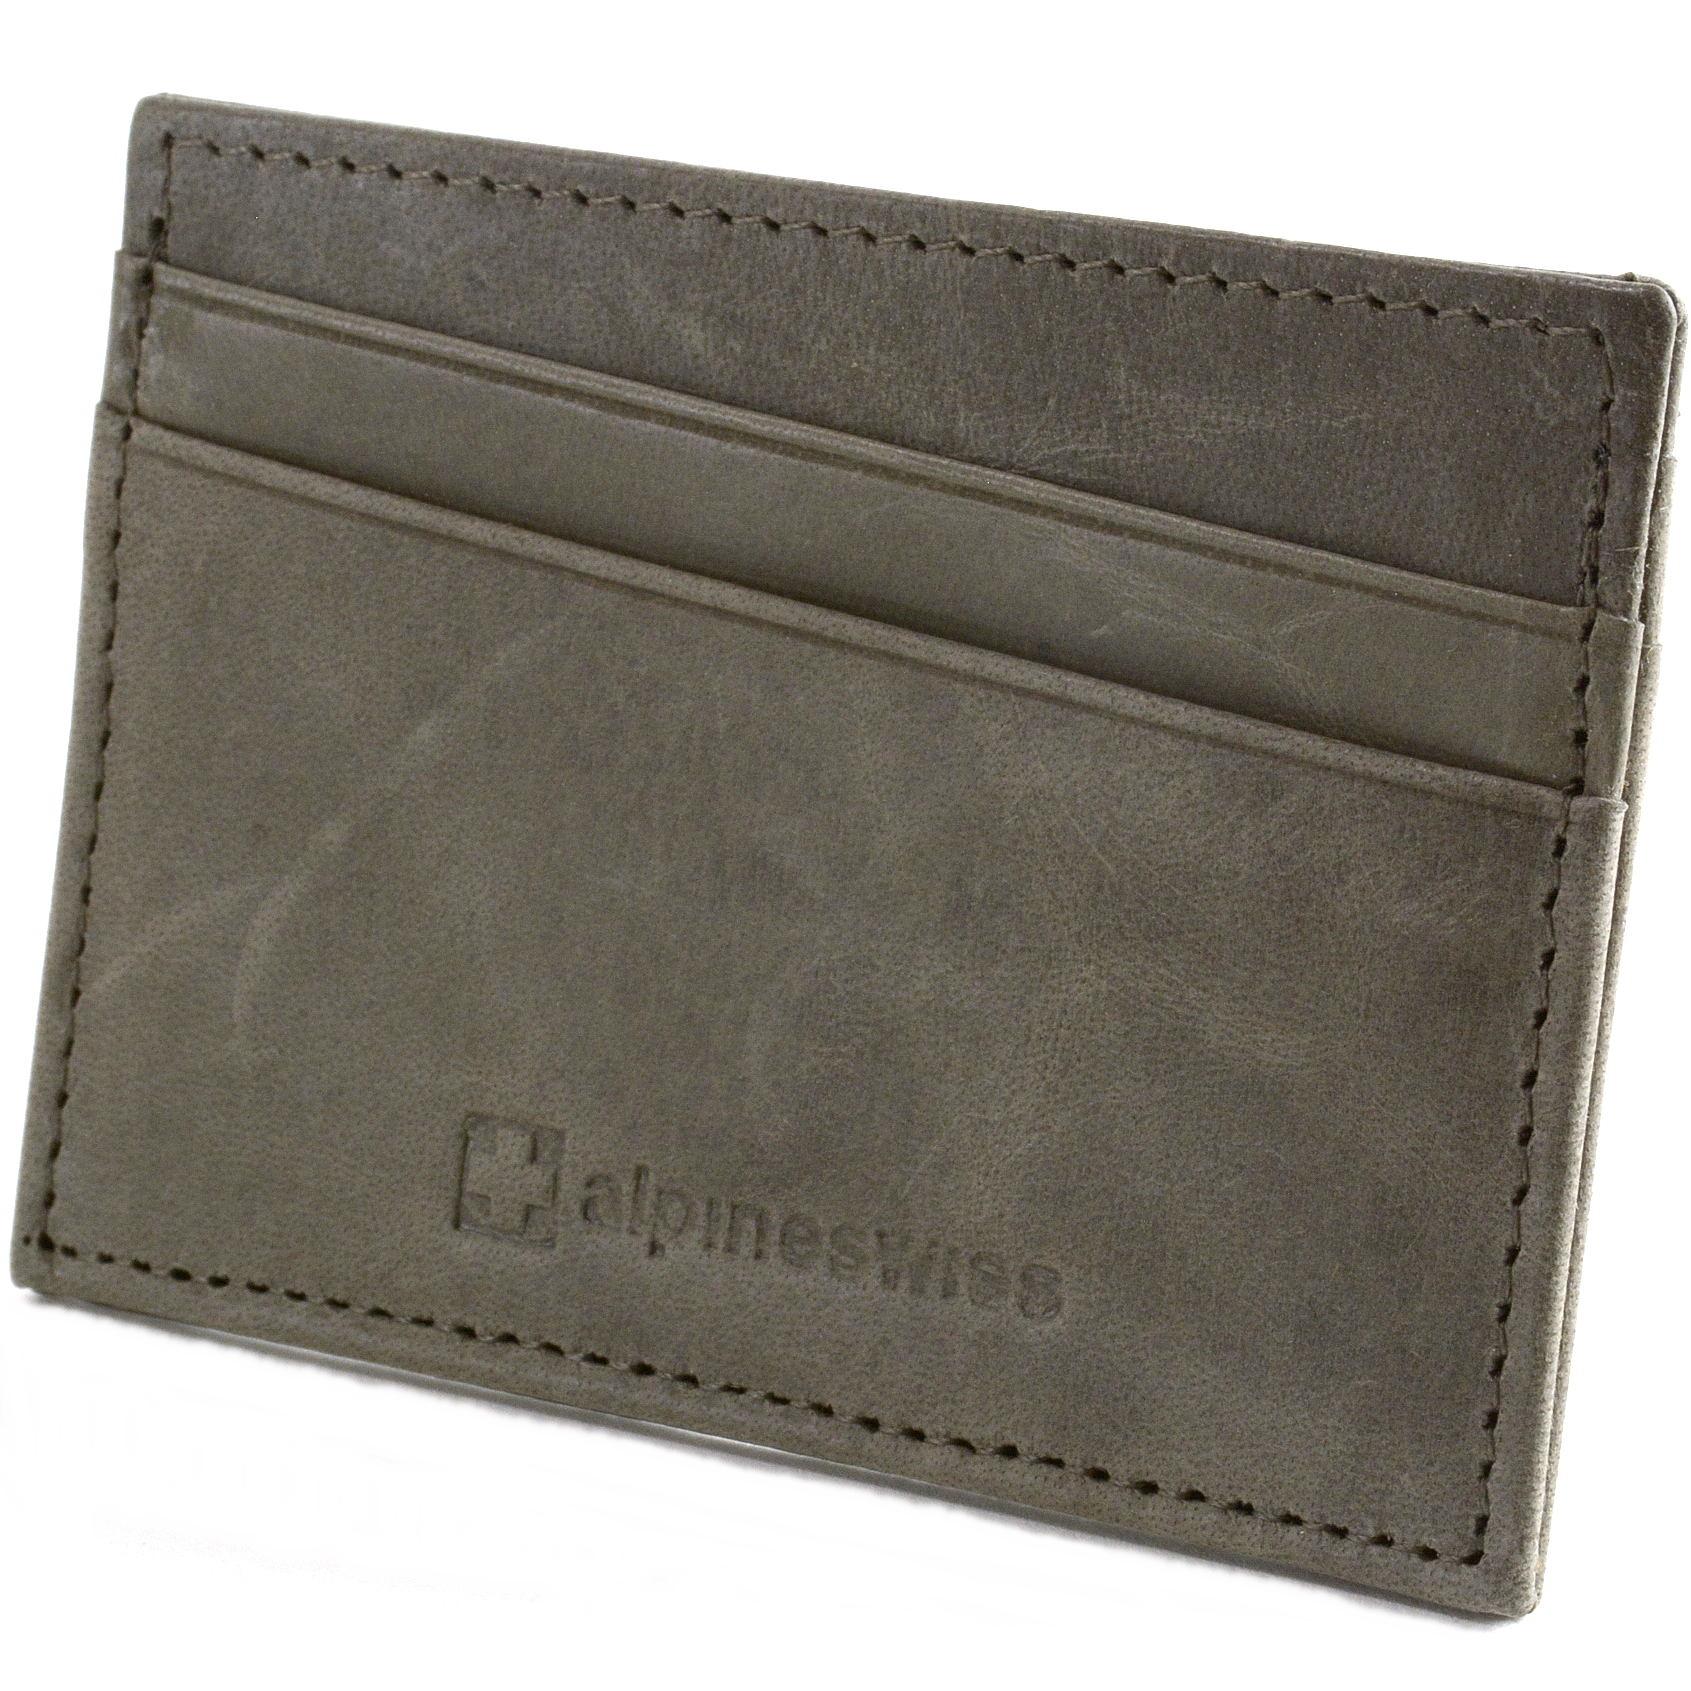 Alpine Swiss Minimalist Leather Front Pocket Wallet 5 Card